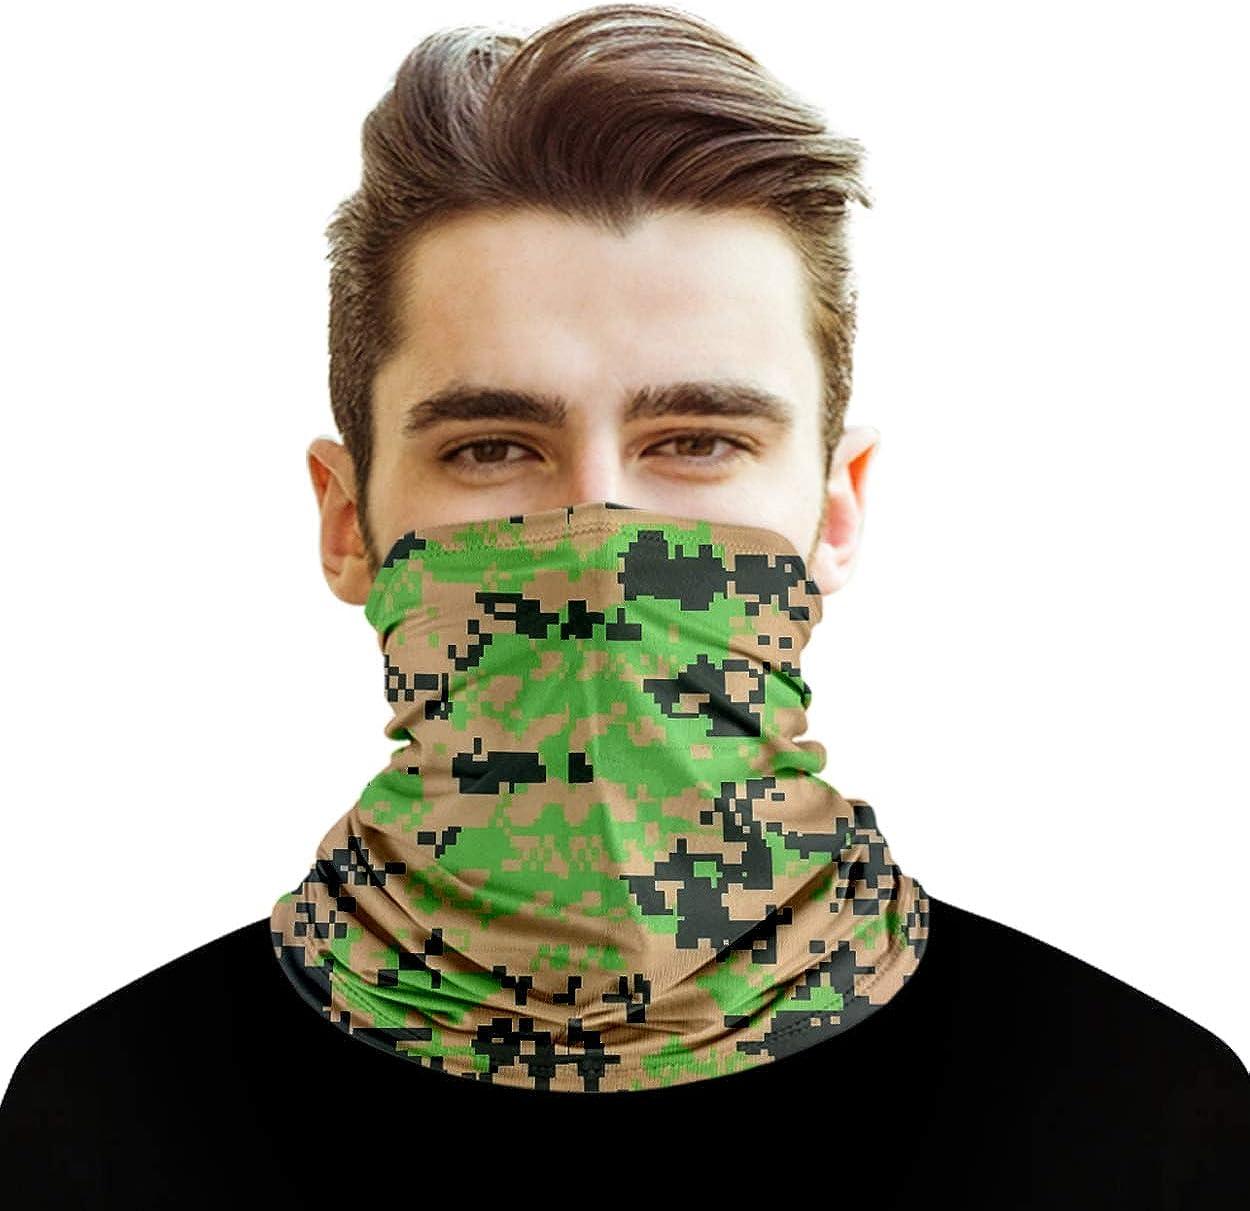 Xiao Face Cover Neck Gaiter Bandnan Face Shield Cooling Reusable Balaclava for Camping Running Cycling Fishing Sport Hunting